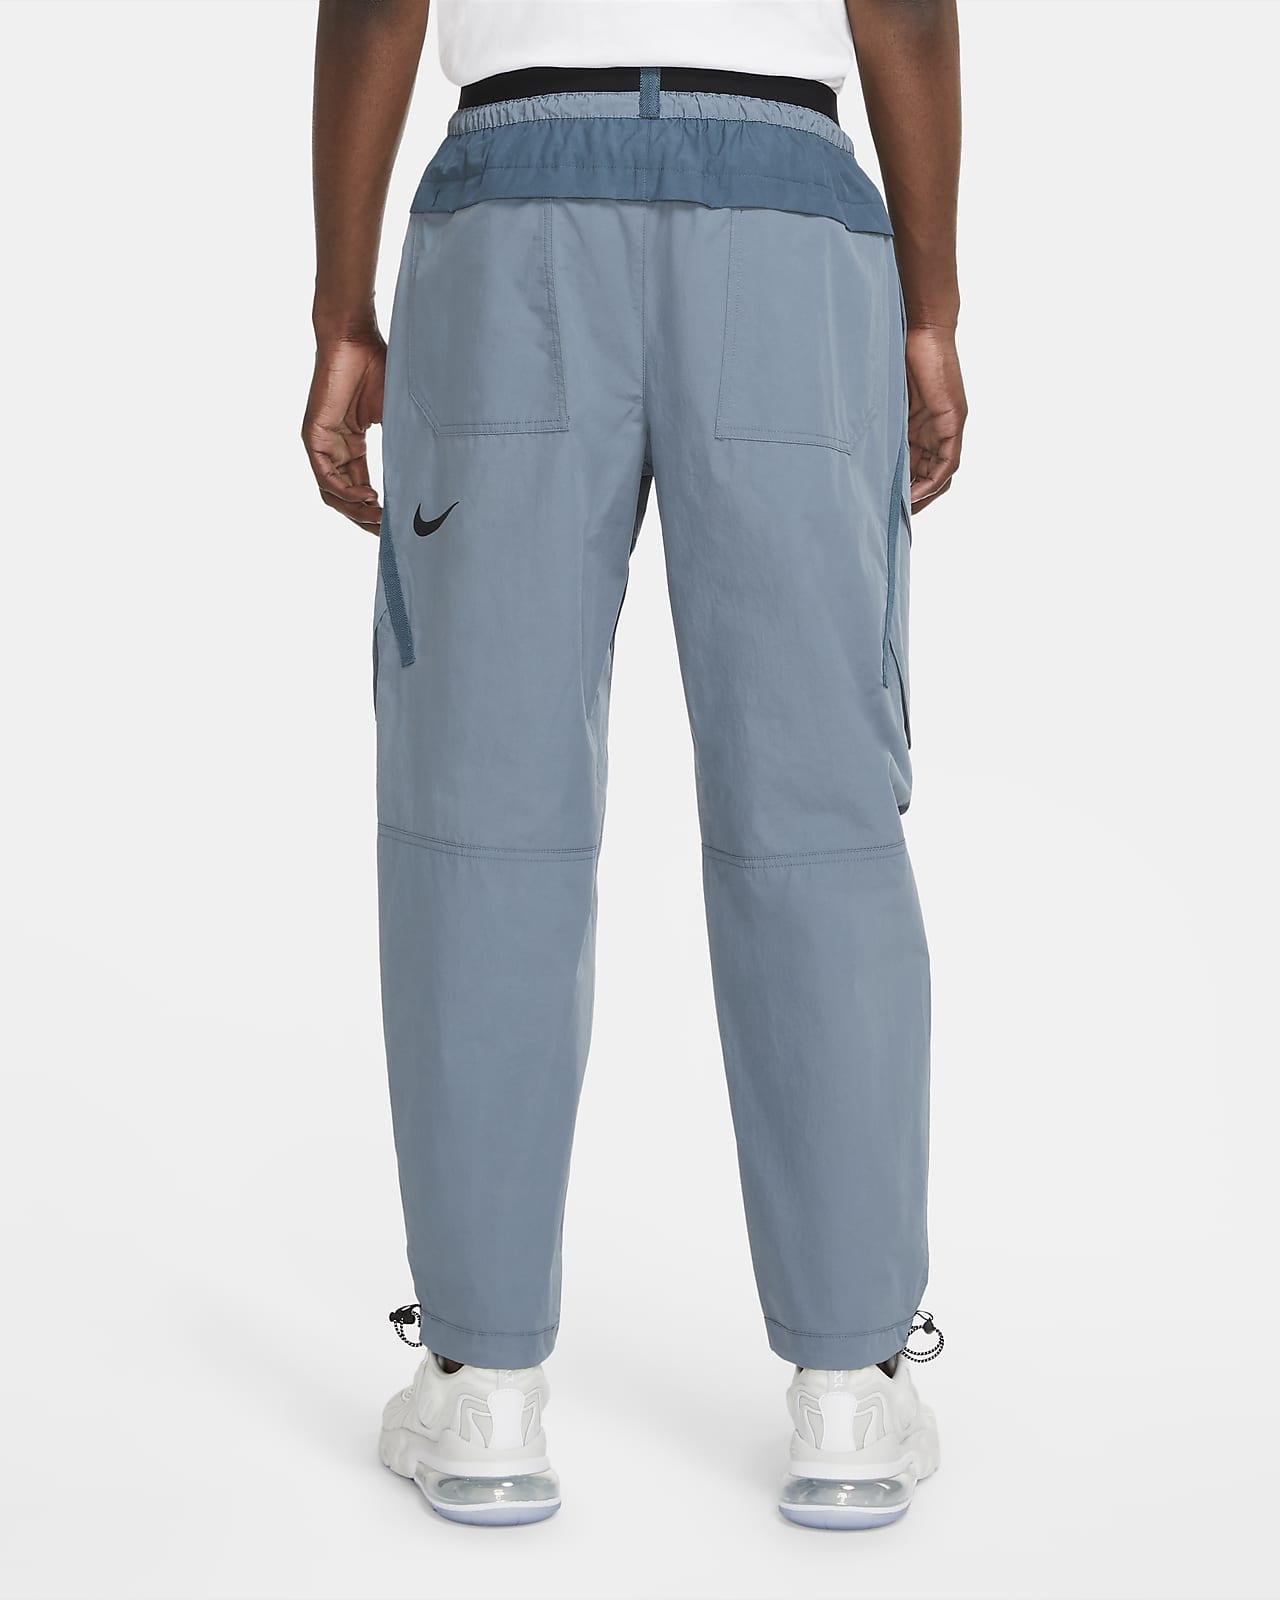 Injusticia entrada pistón  Nike Sportswear Tech Pack Men's Woven Trousers. Nike SA